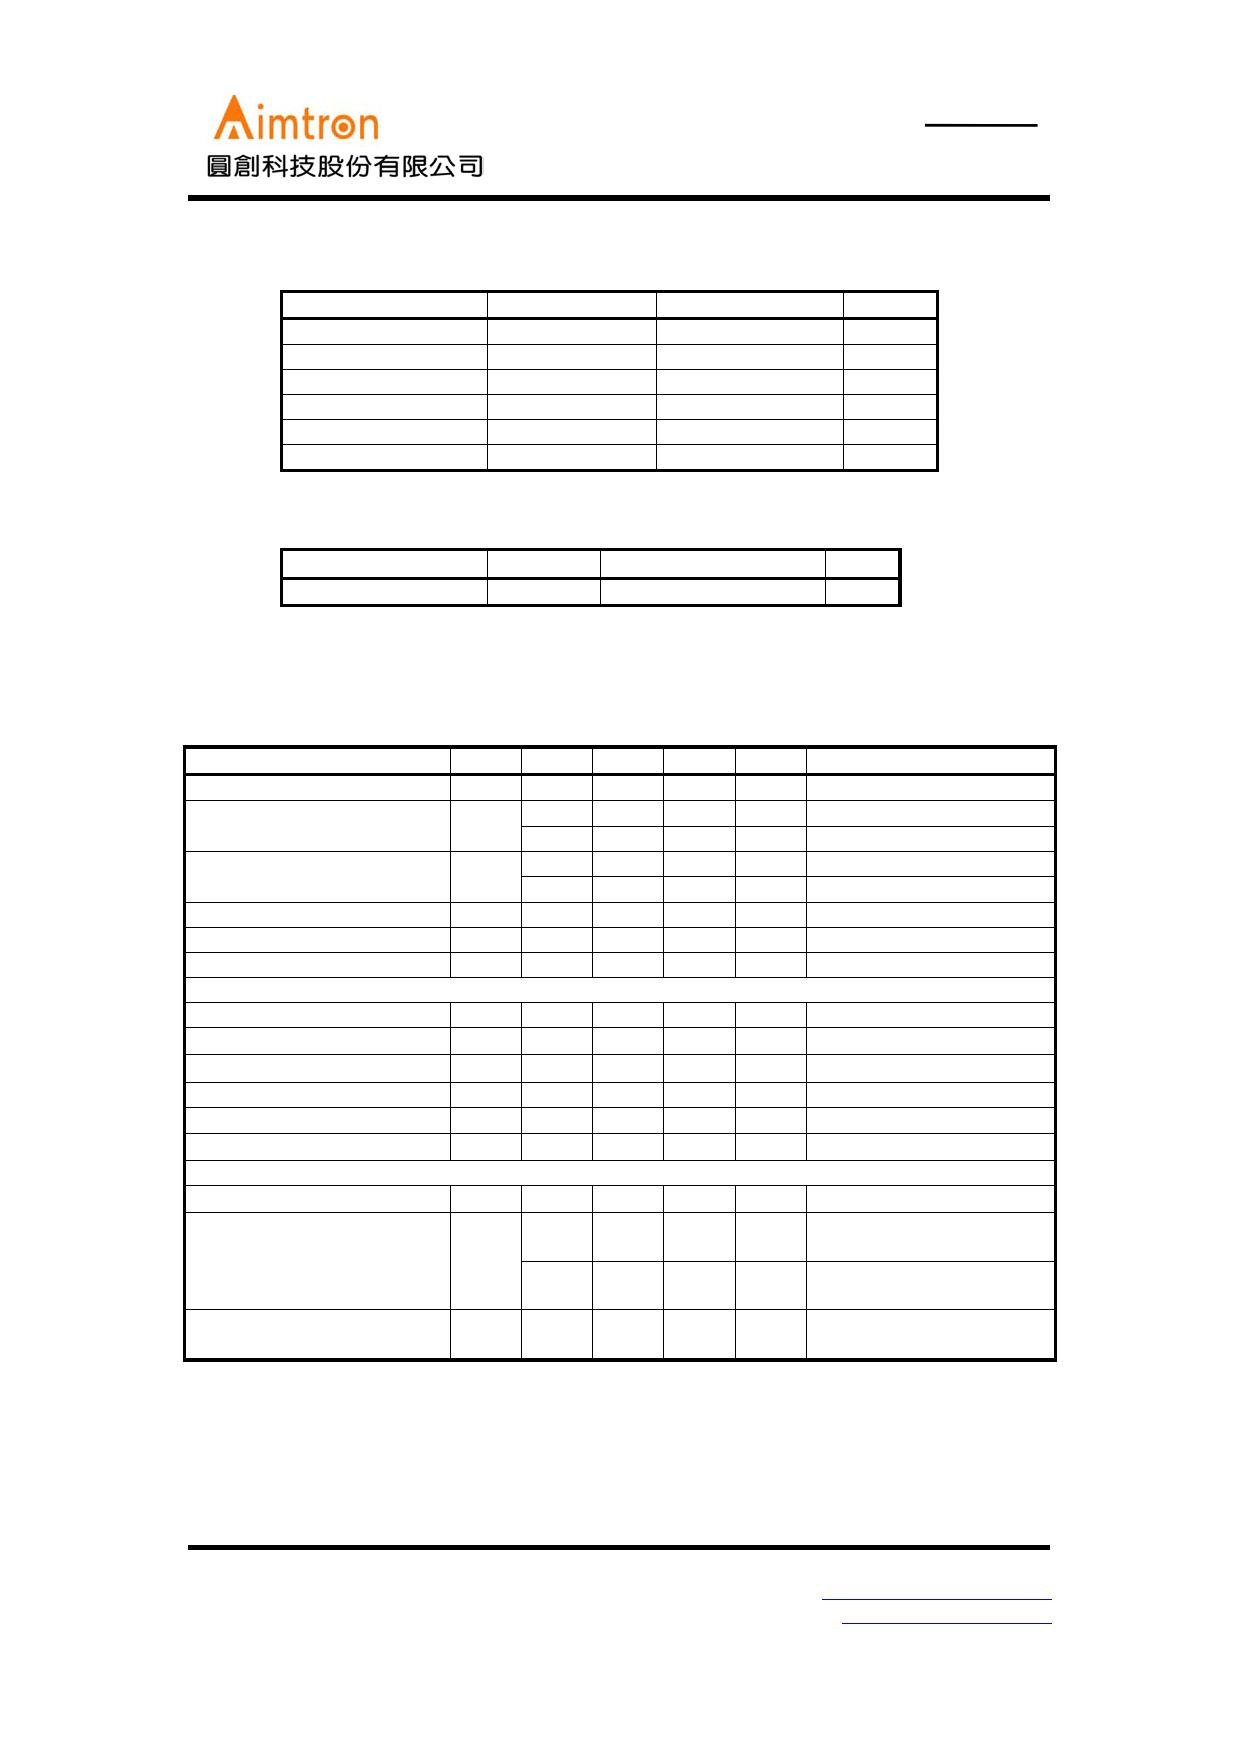 AT1506 pdf, ピン配列